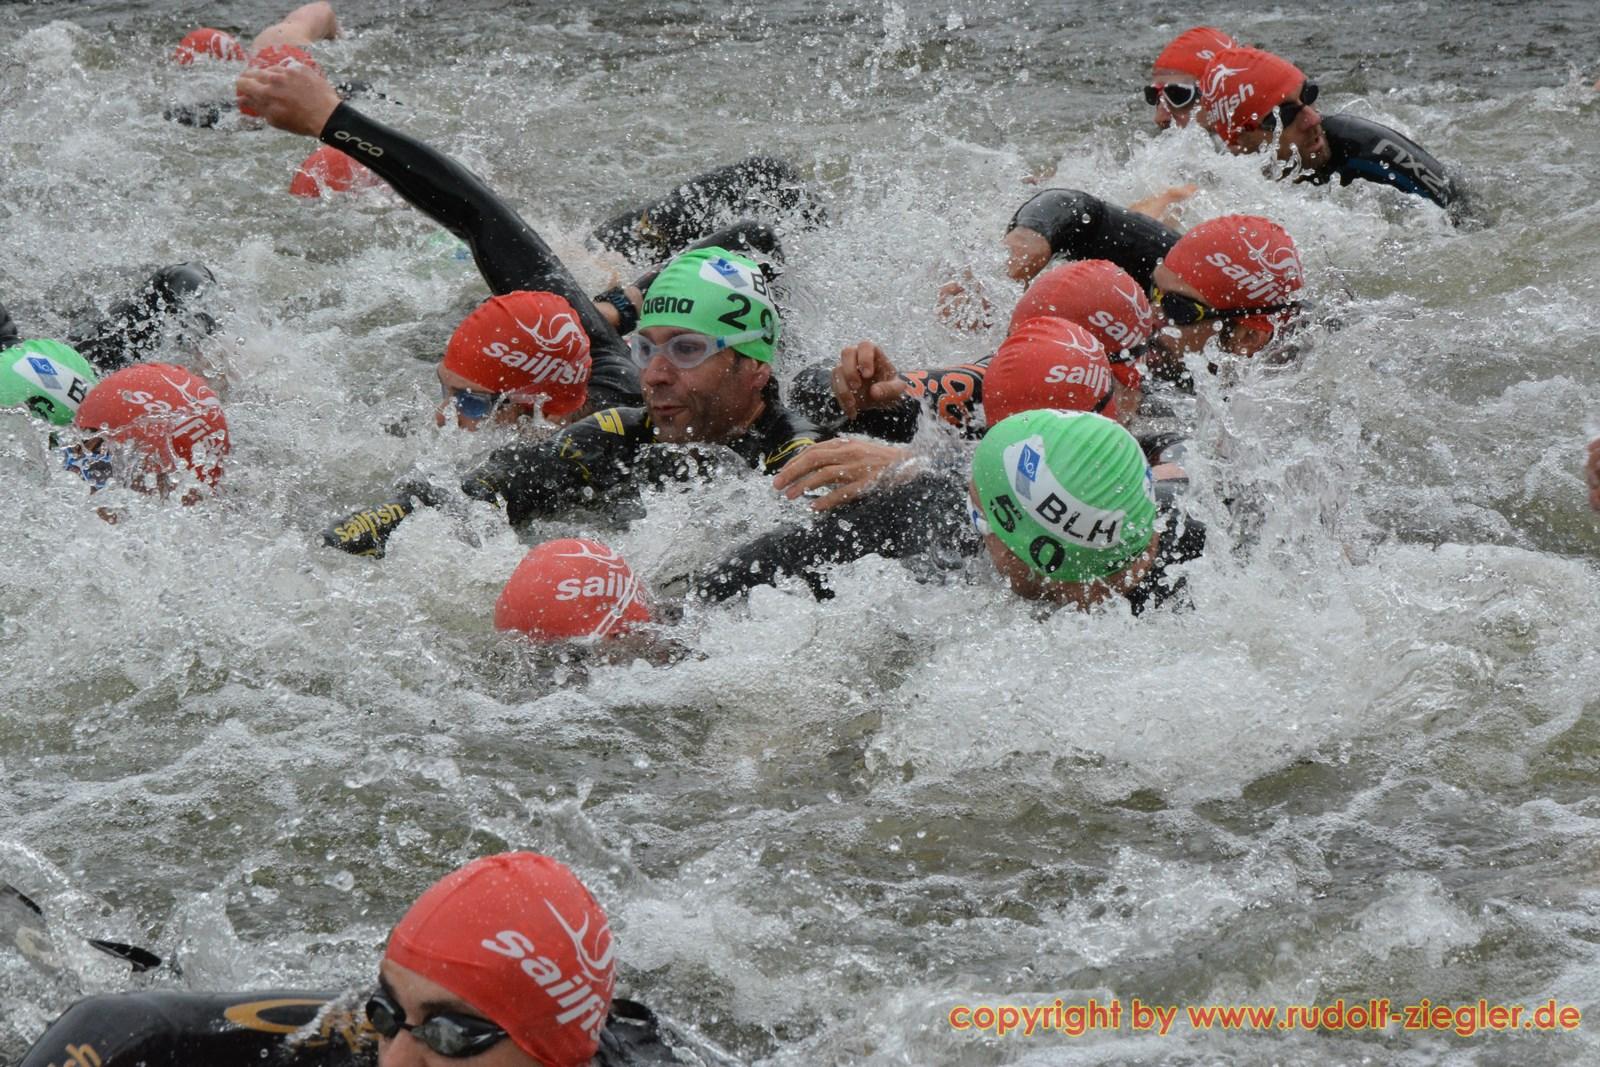 Kapuziner Alkoholfrei Triathlon 2016 112-A (1600x1200)